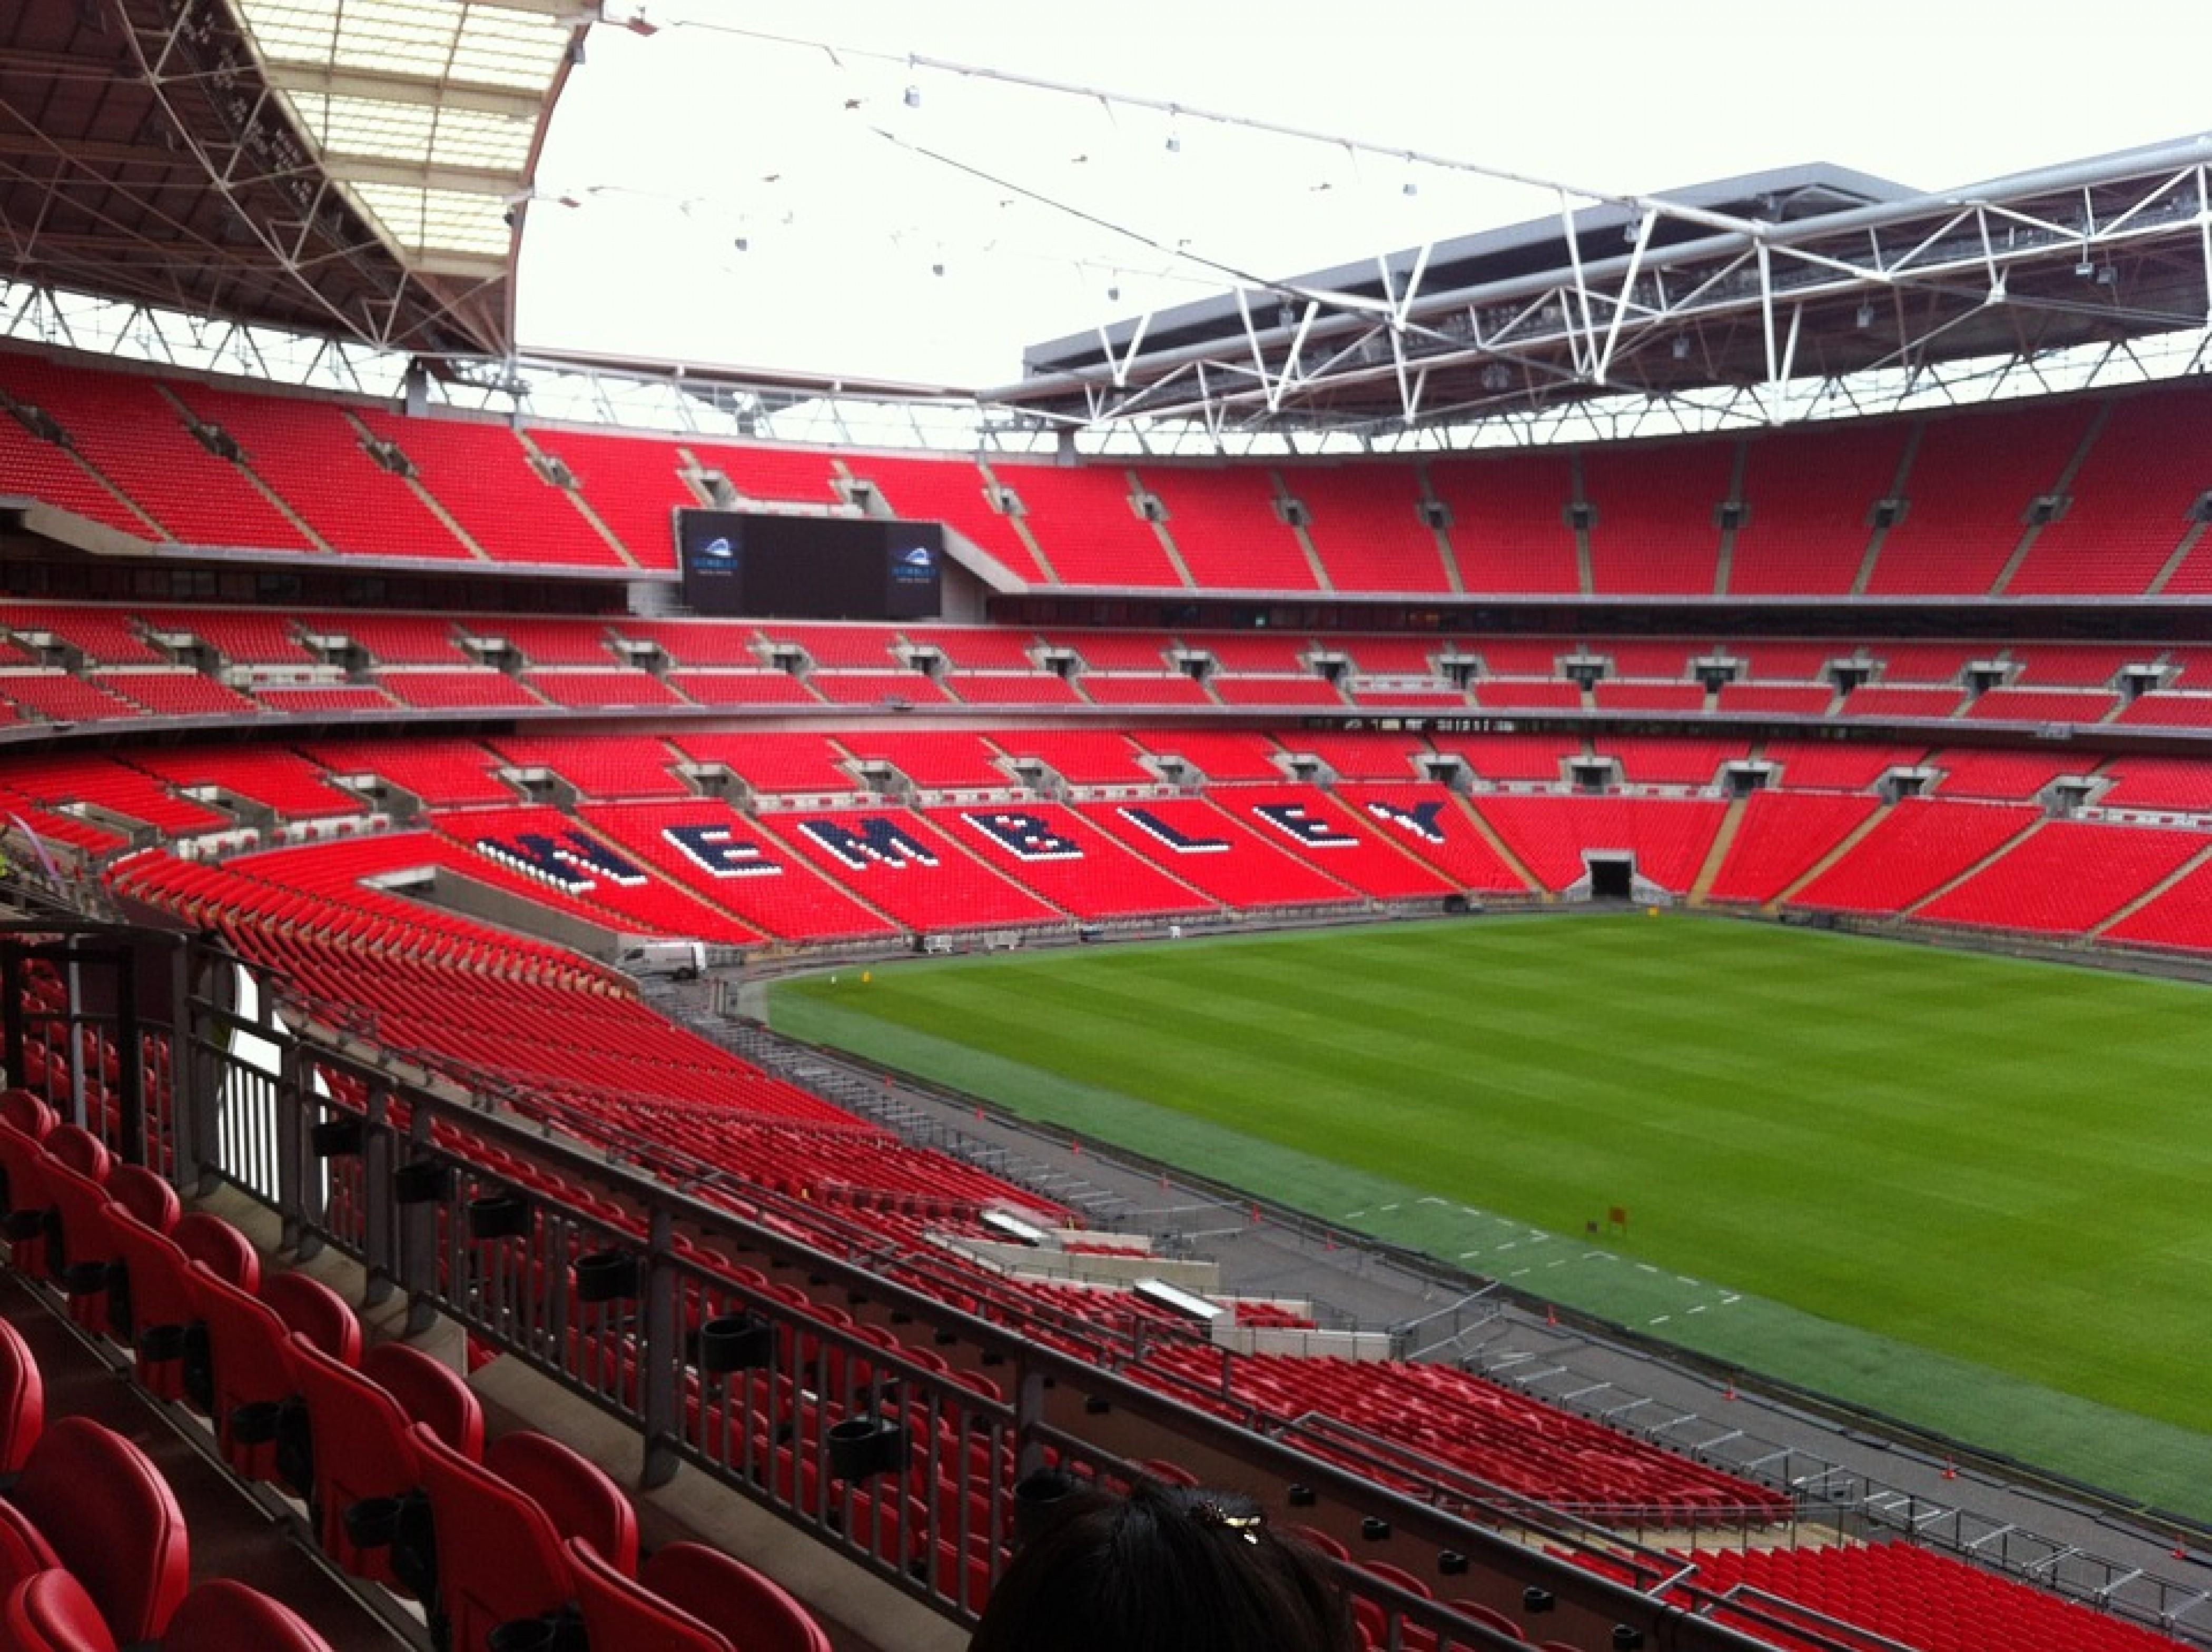 Tottenham Hotspur vs Liverpool Preview: Unbeaten Reds face Wembley examination